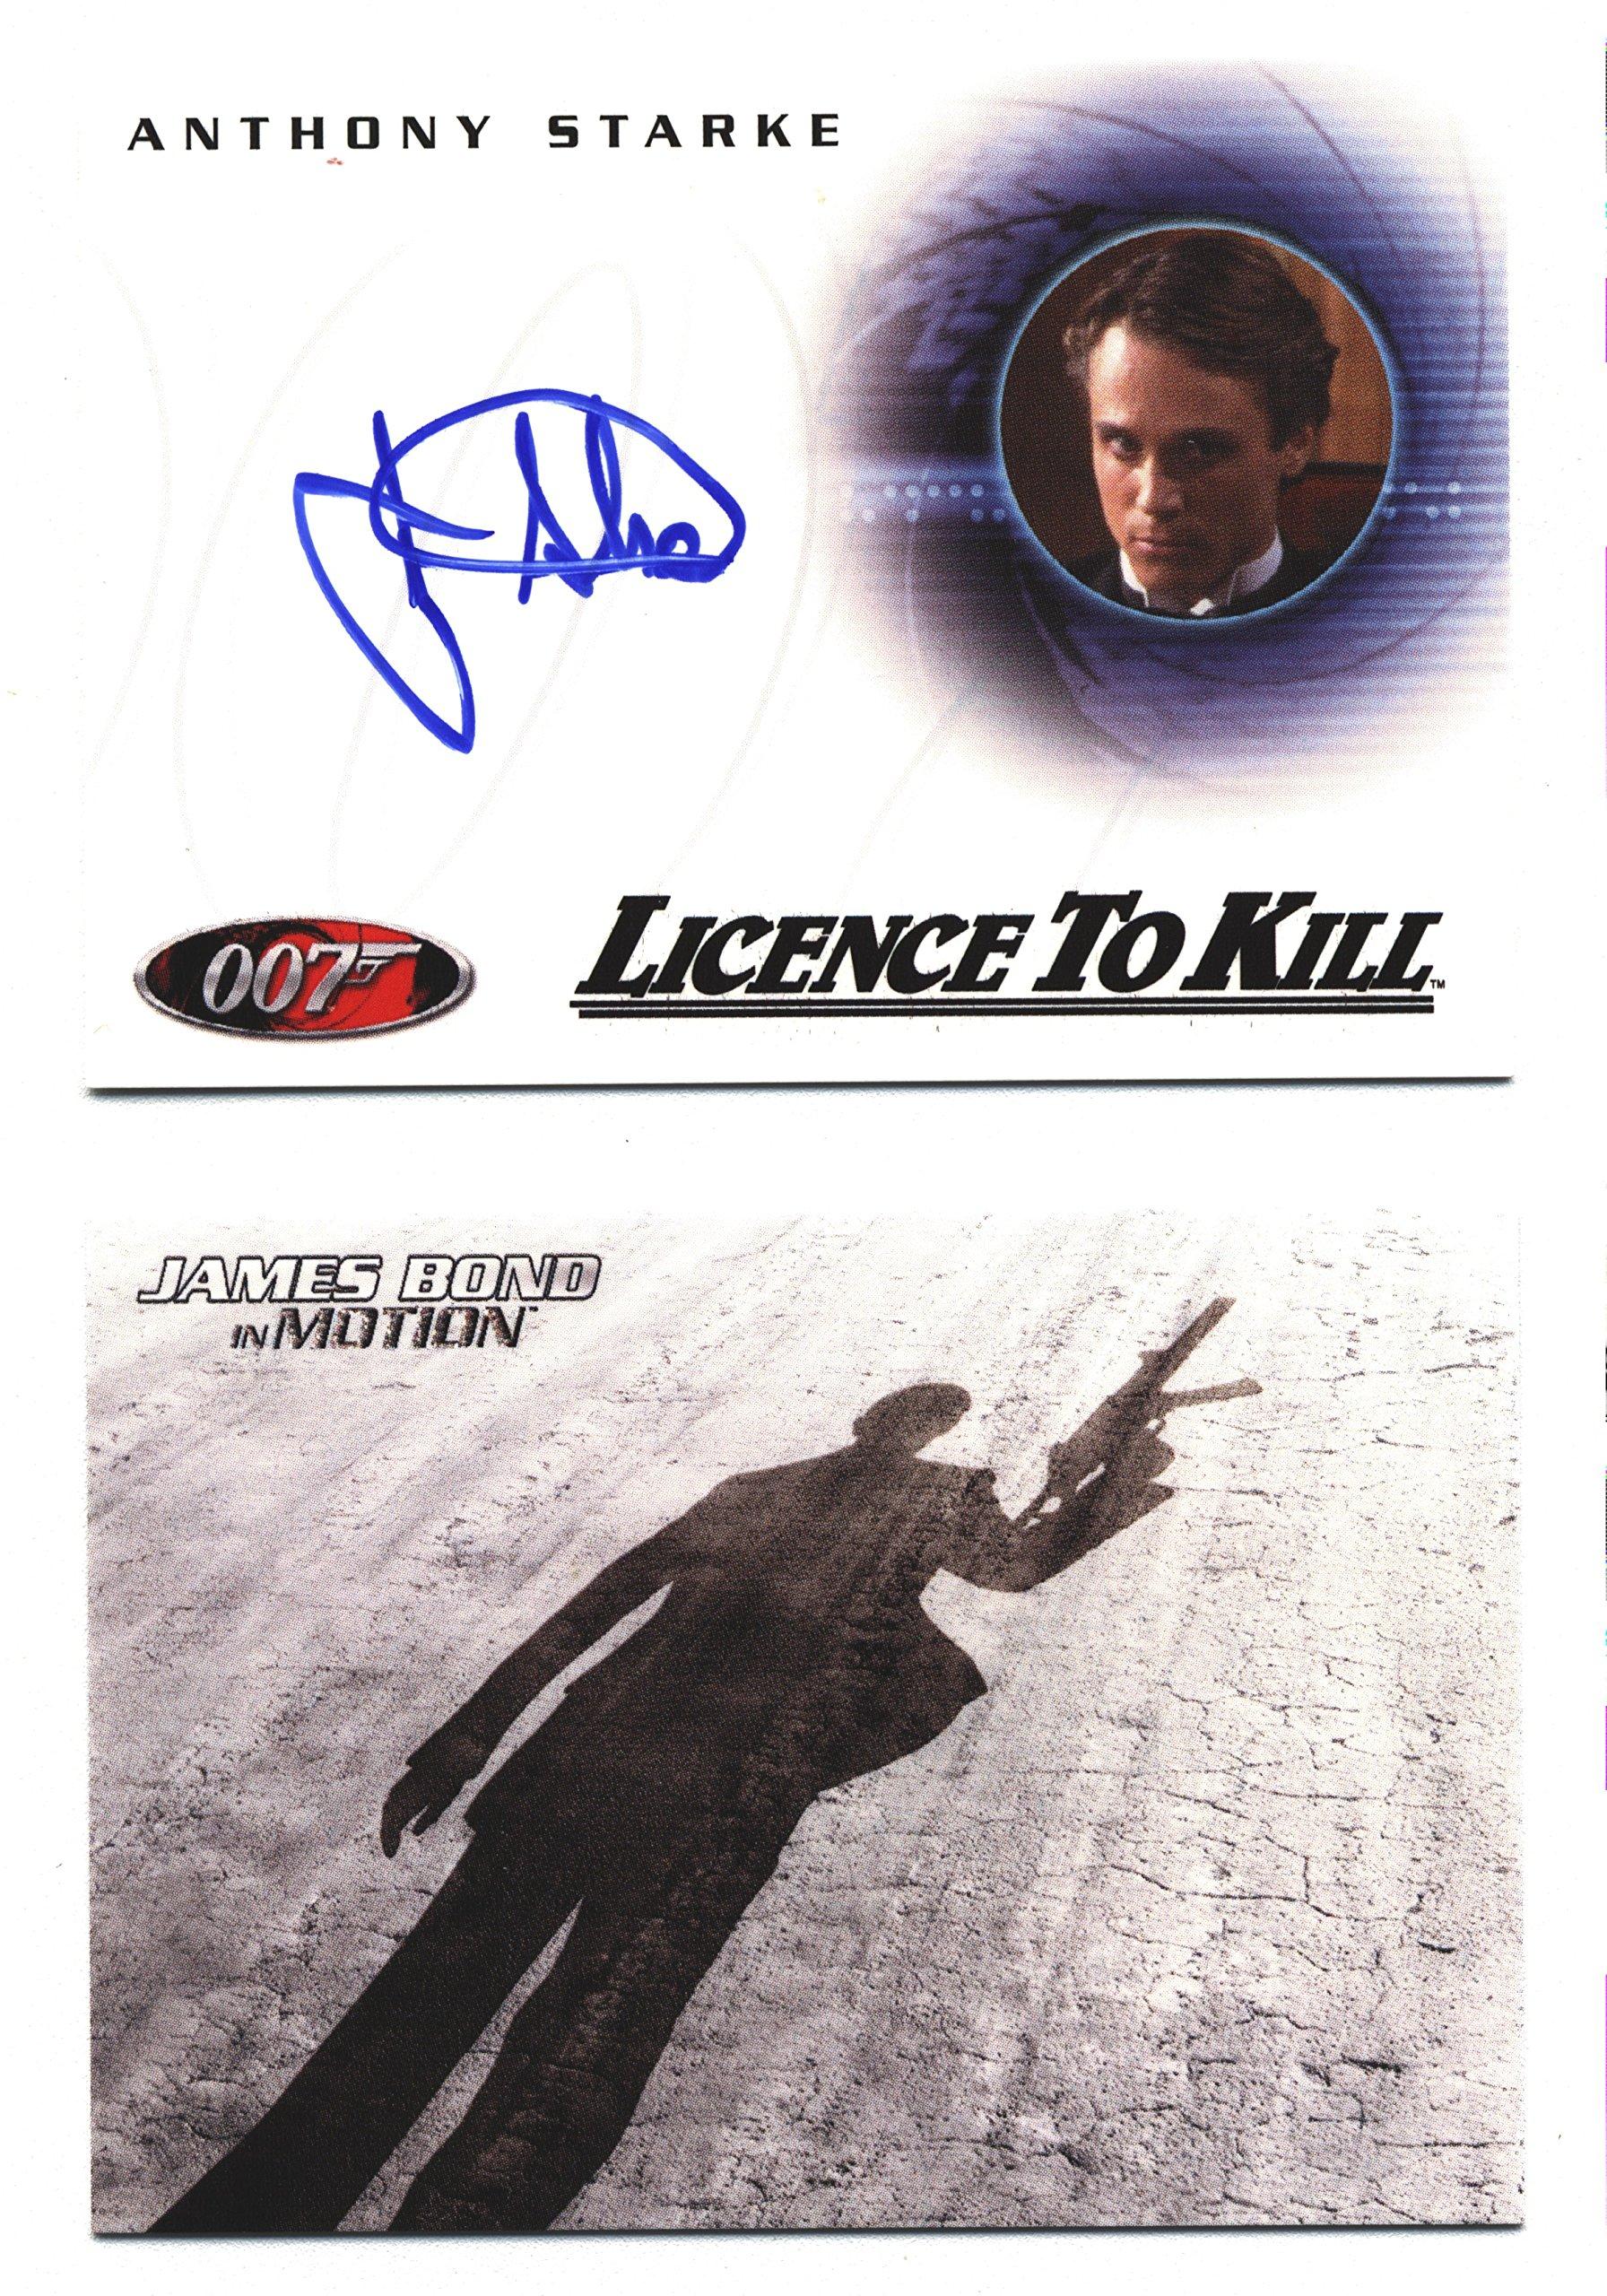 James Bond 007 in Motion Trading Card Album